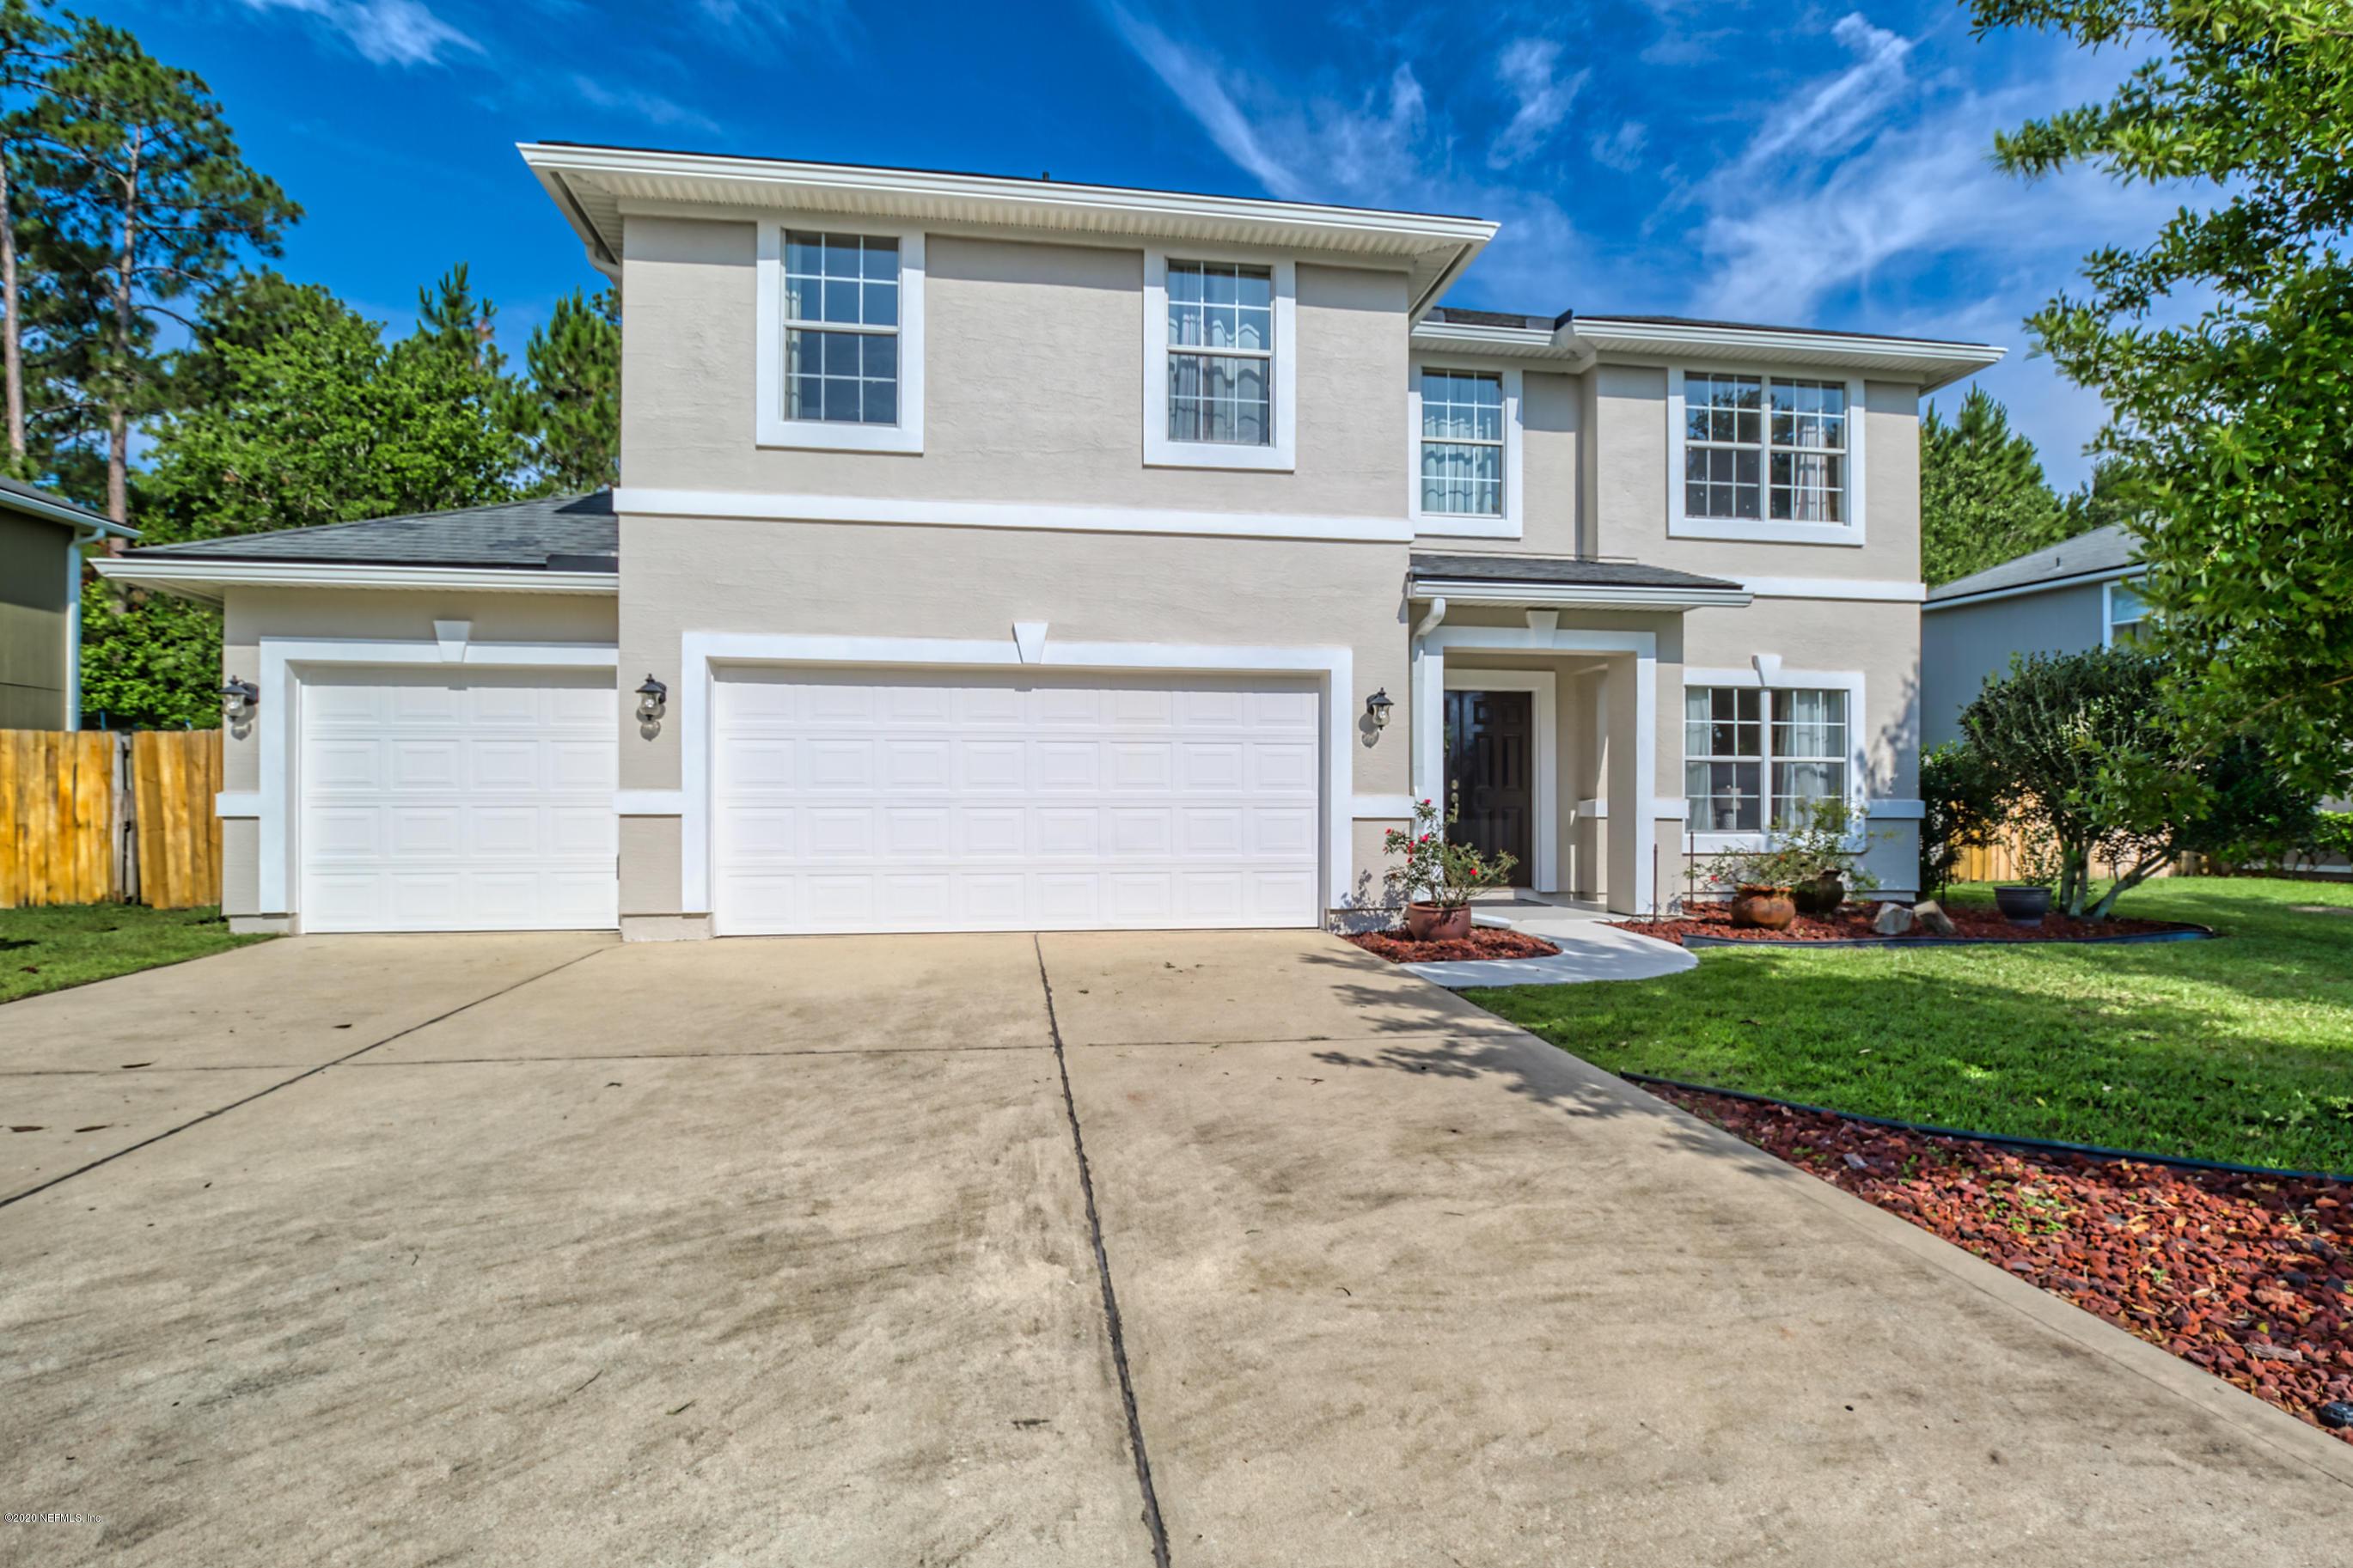 1339 Ivyhedge Ave St Augustine, FL 32092